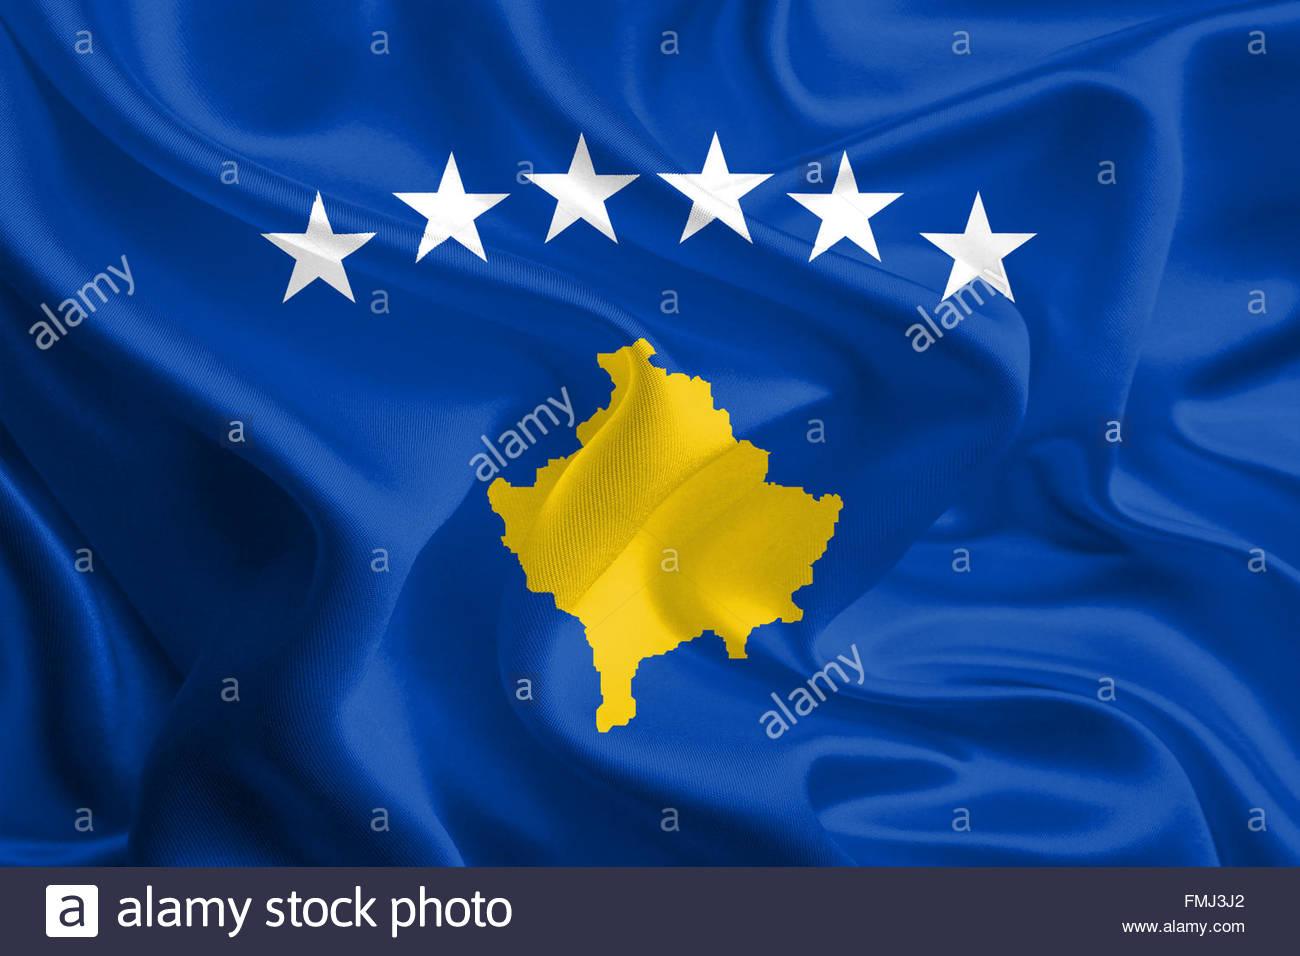 Waving Fabric Flag of Kosovo Stock Photo